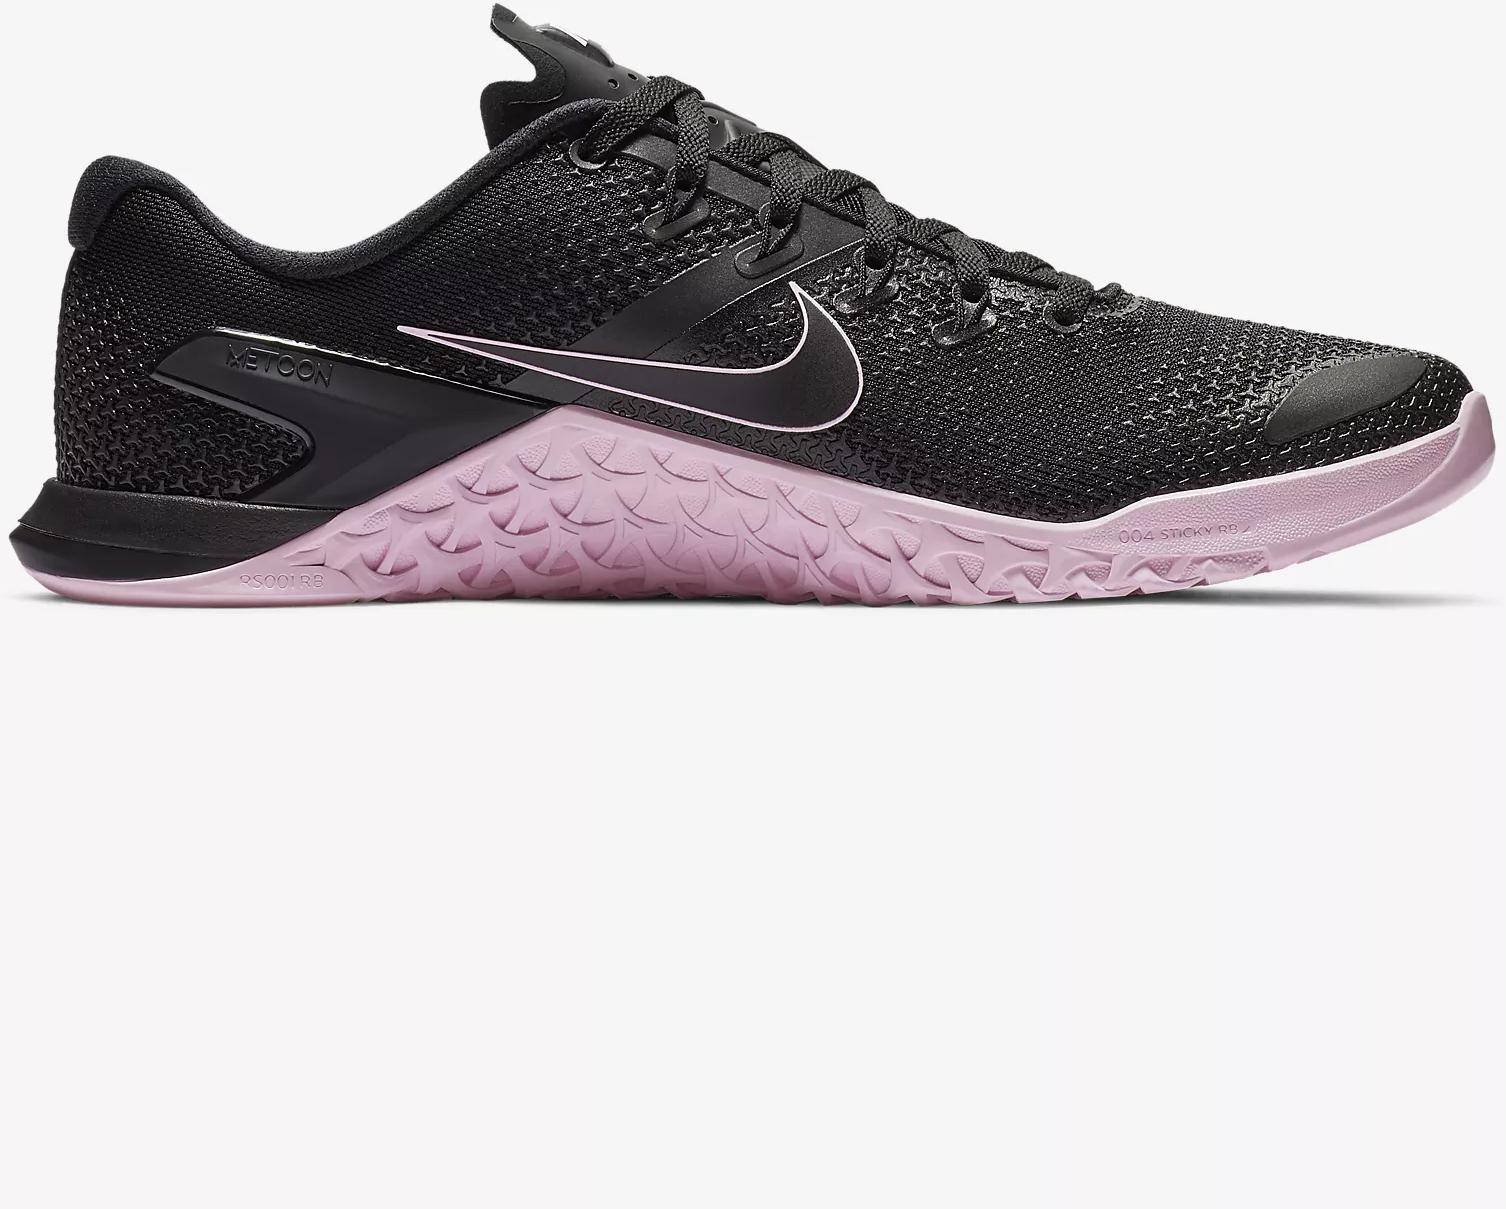 Nike Metcon 4 vs Metcon 3 Training Shoe